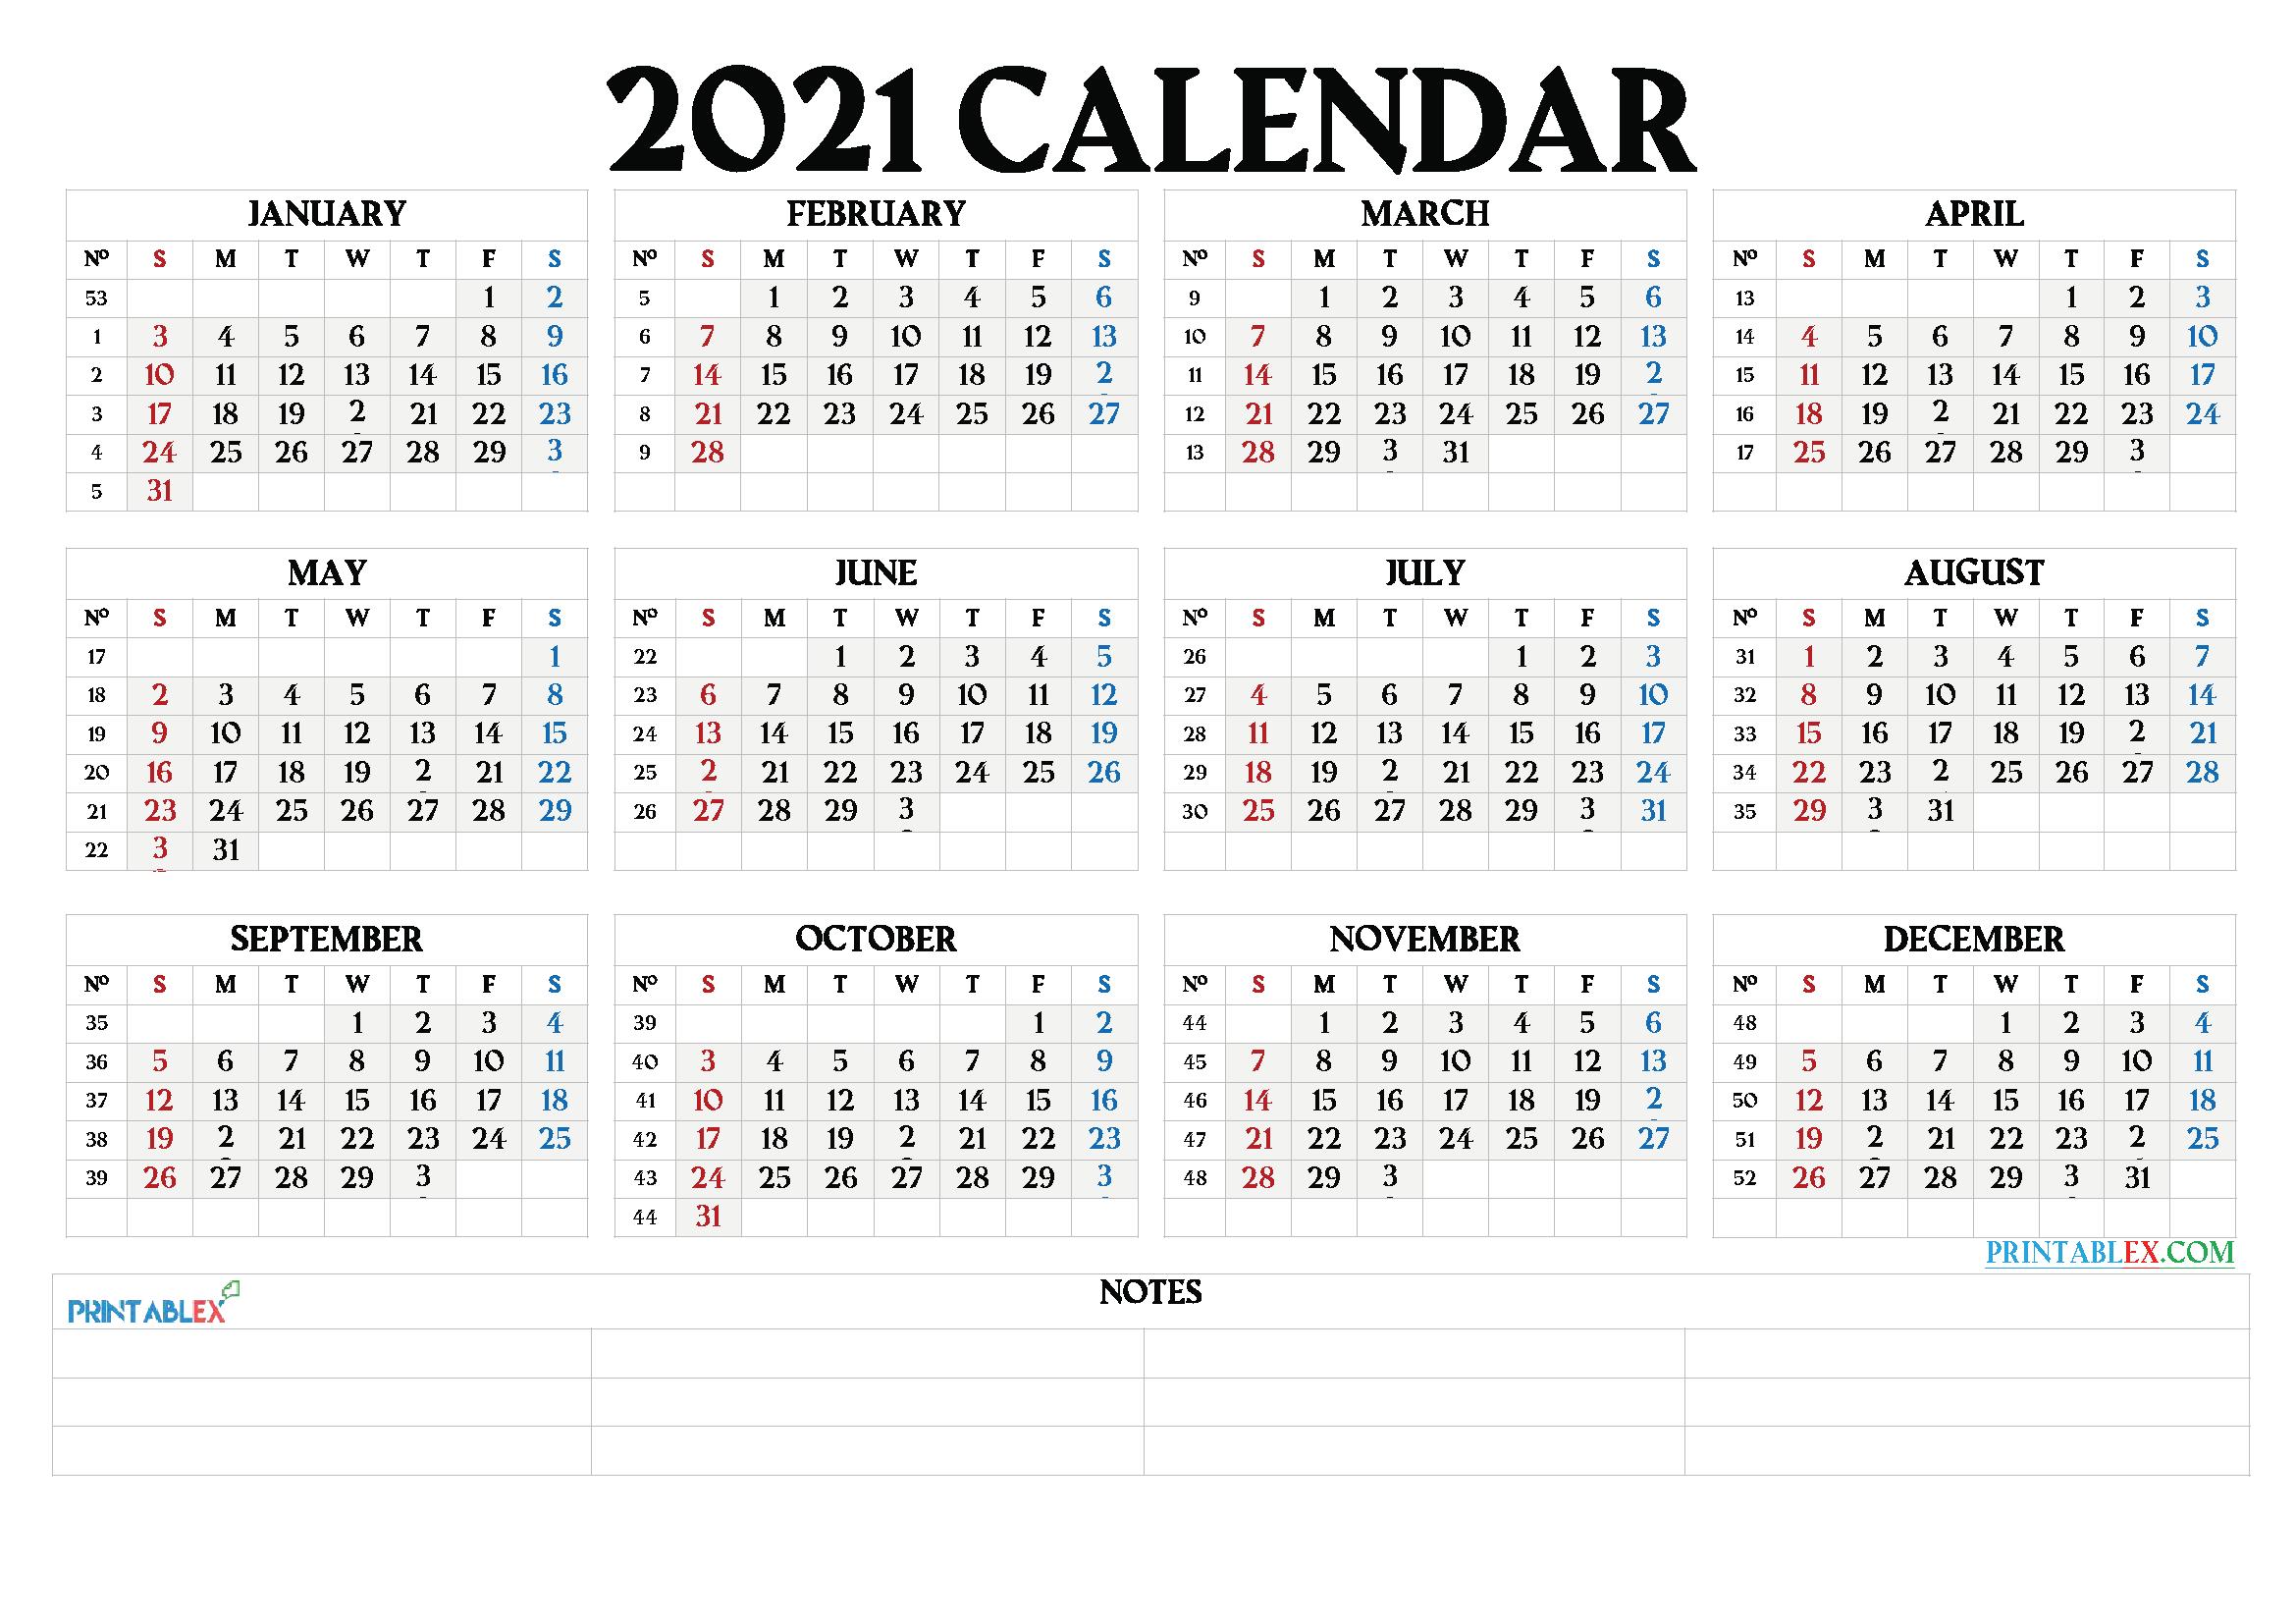 Printable 2021 Calendarmonth